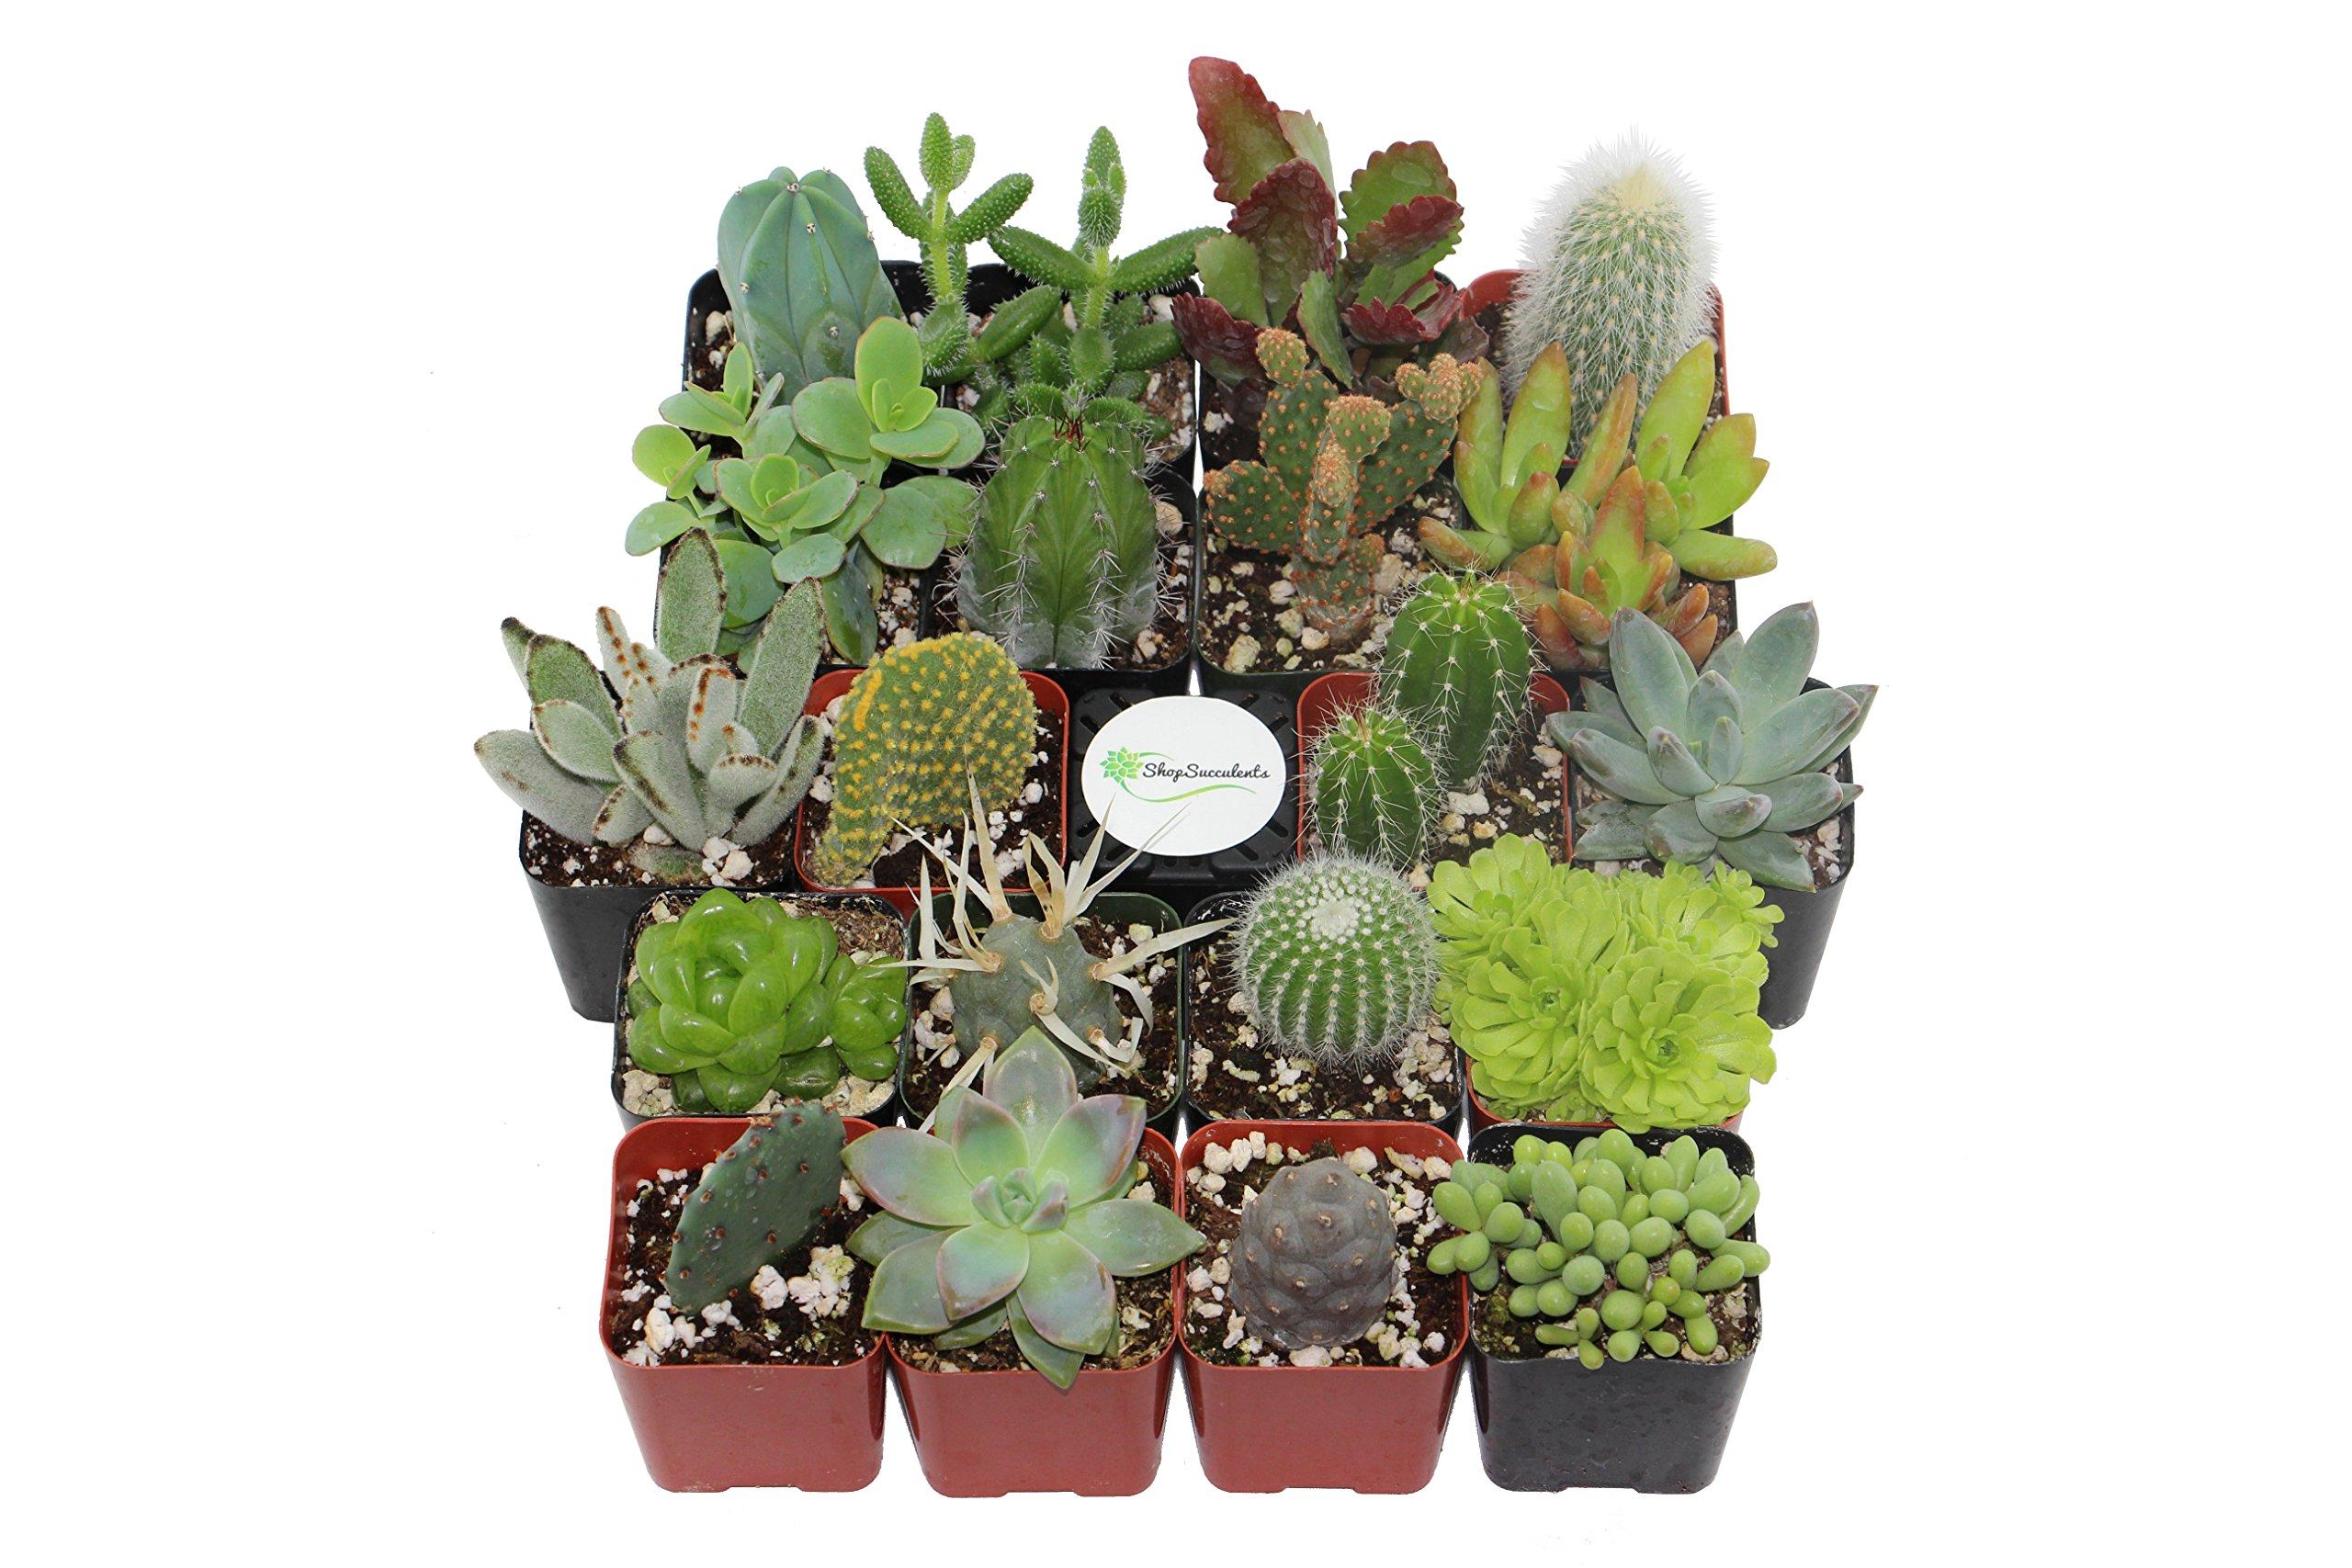 Shop Succulents | Cactus & Succulent Collection of Live Succulent Plants, Hand Selected Variety Pack of Cacti and Mini Succulents | Collection of 20 by Shop Succulents (Image #2)